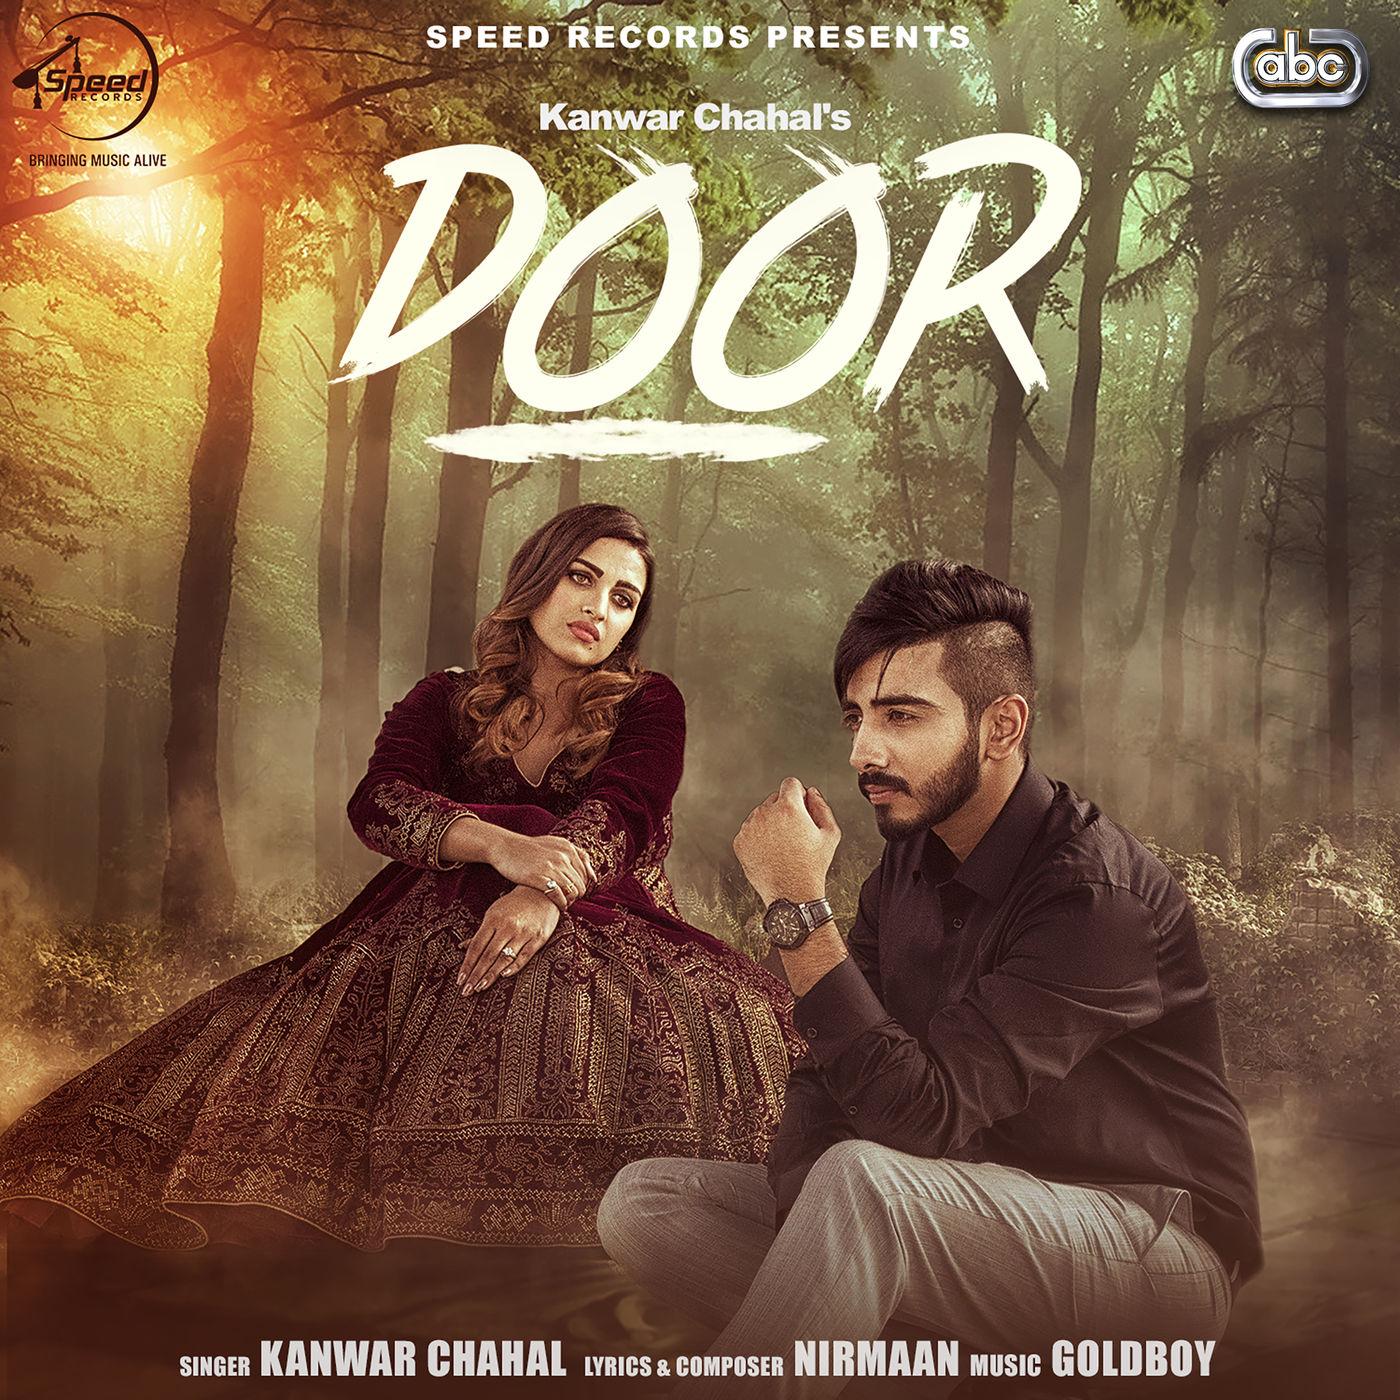 DOOR LYRICS \u2013 Kanwar Chahal   Punjabi Song  sc 1 st  song & song: DOOR LYRICS \u2013 Kanwar Chahal   Punjabi Song